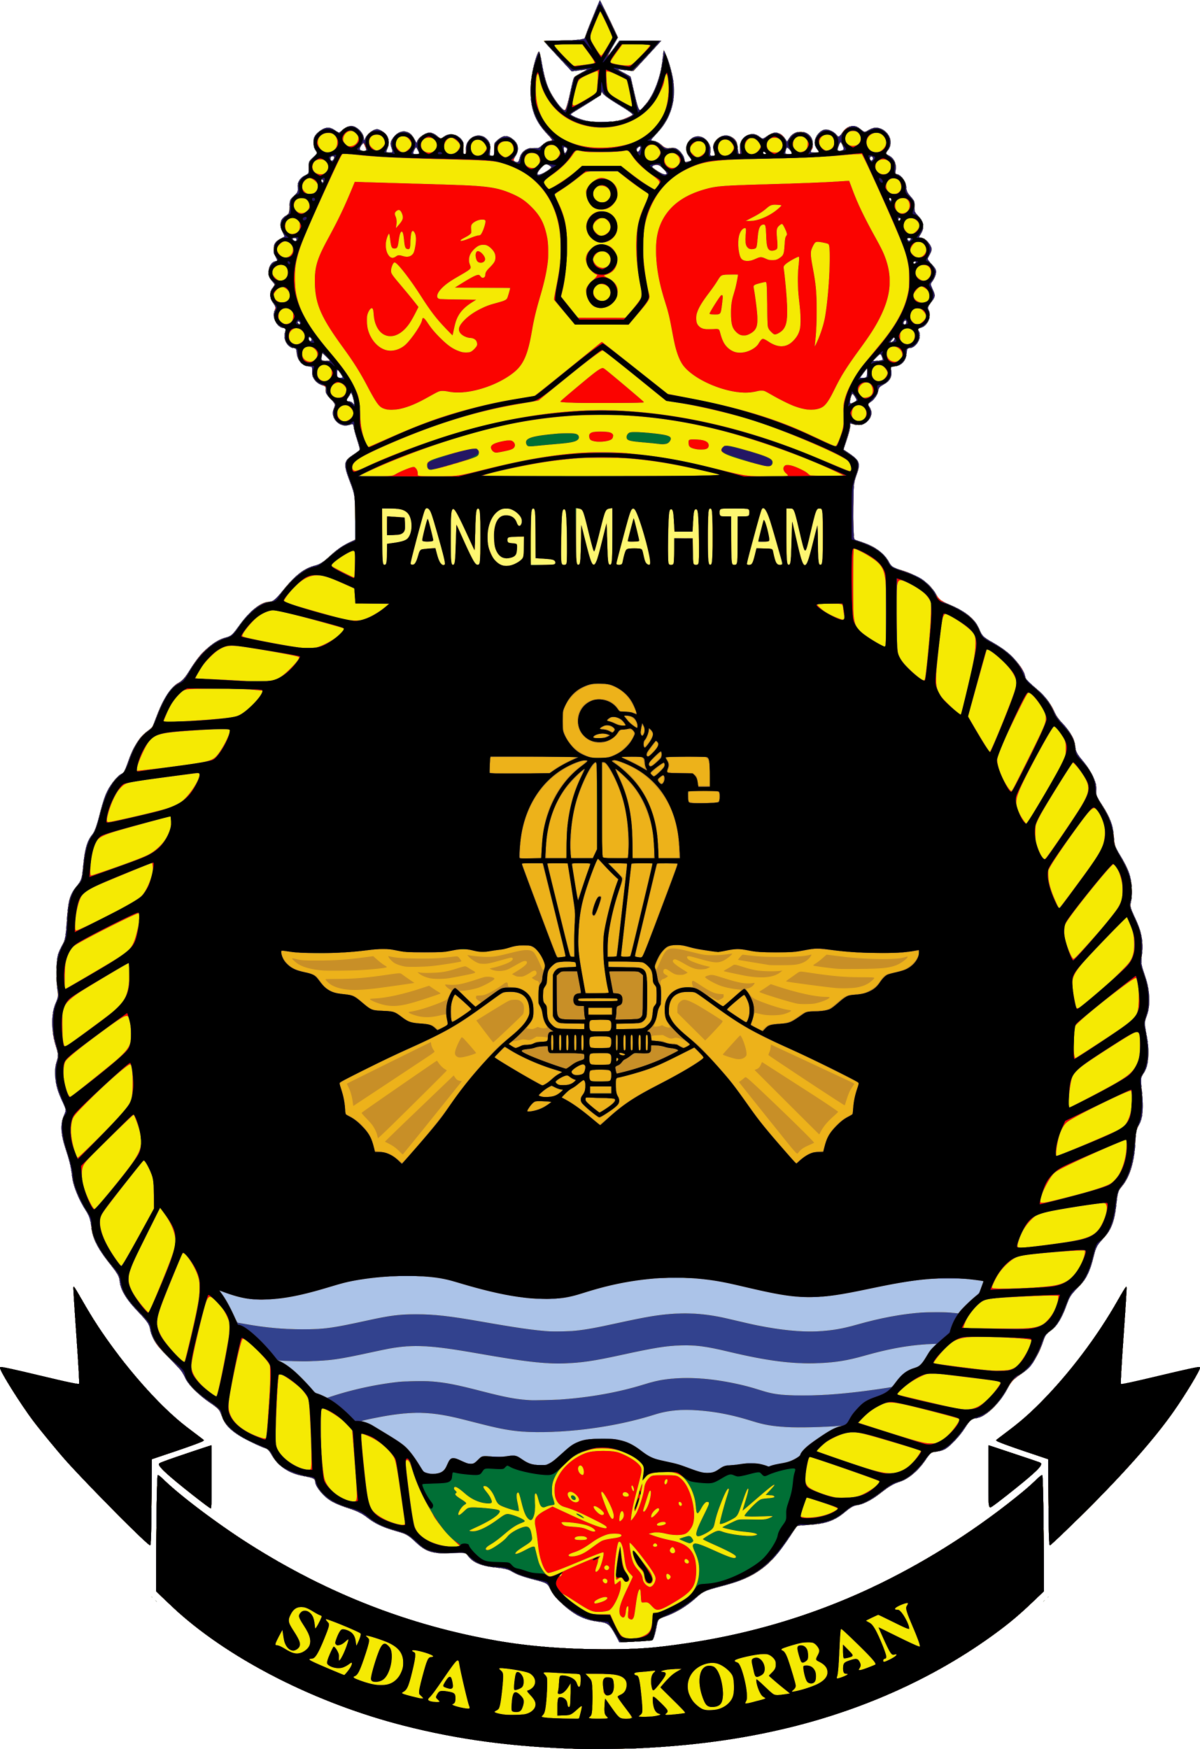 Paskal wikipedia . Clipart anchor seaman logo